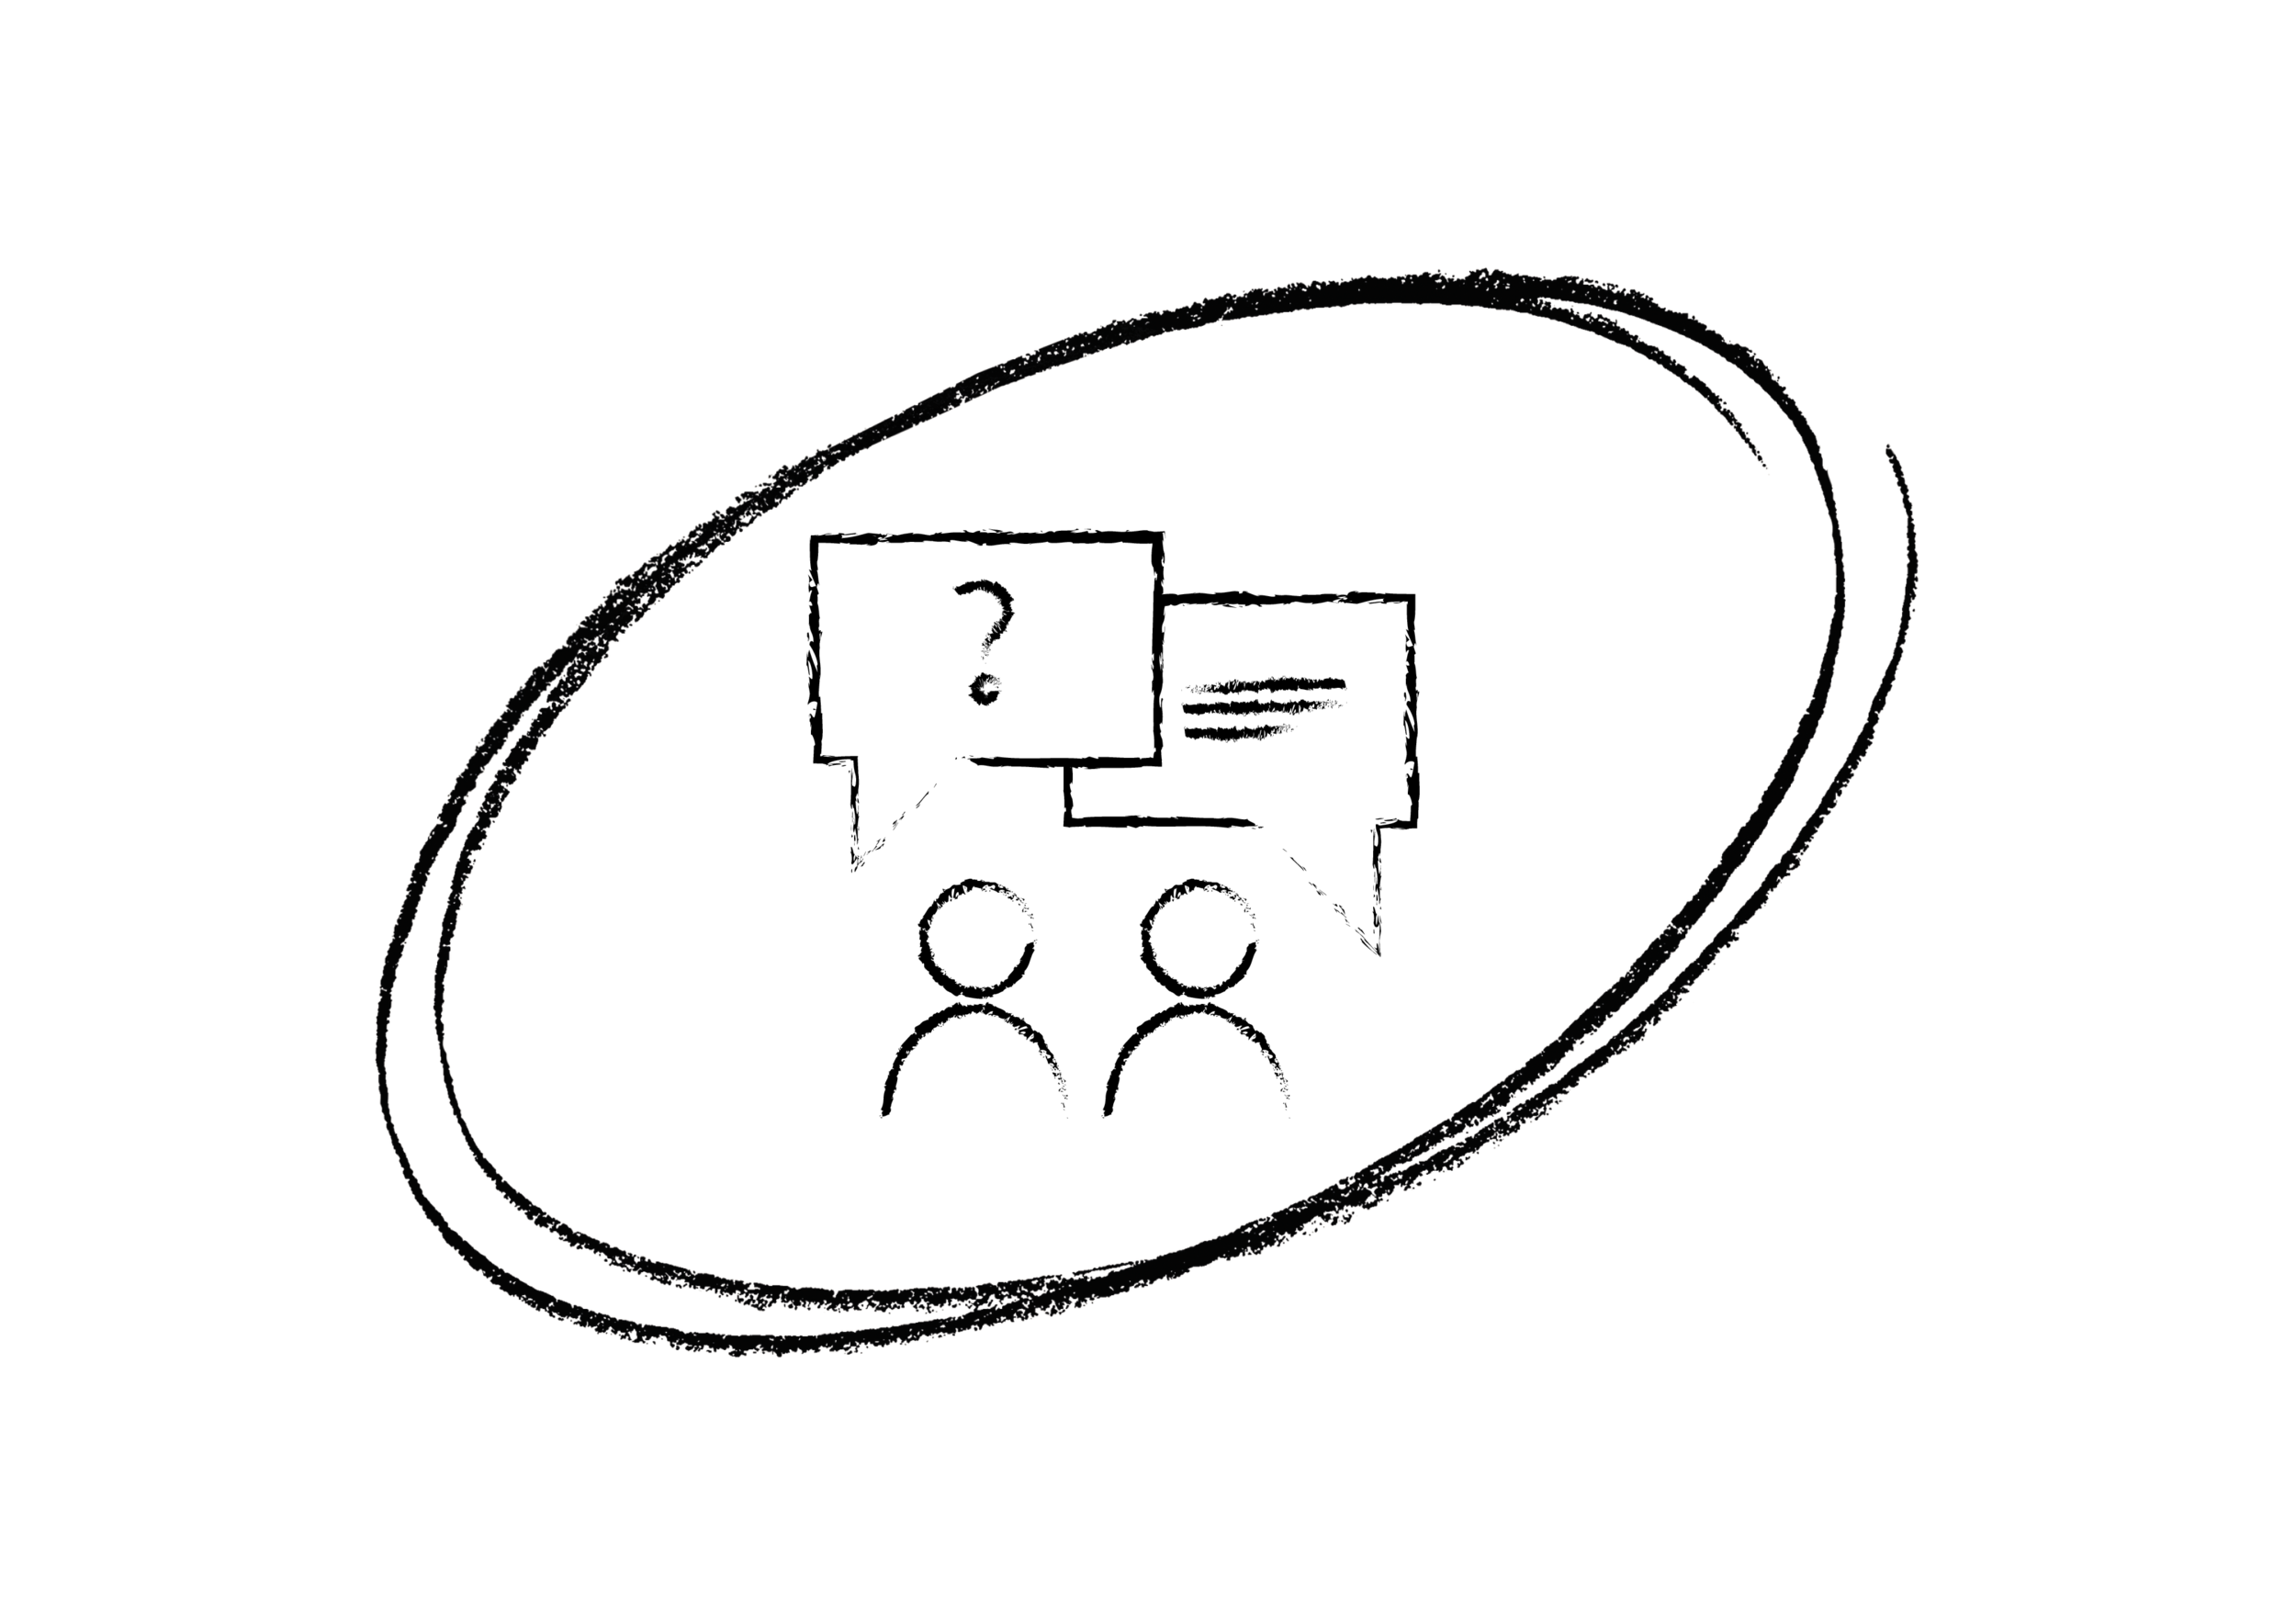 analytic-thinking-Beratung.png